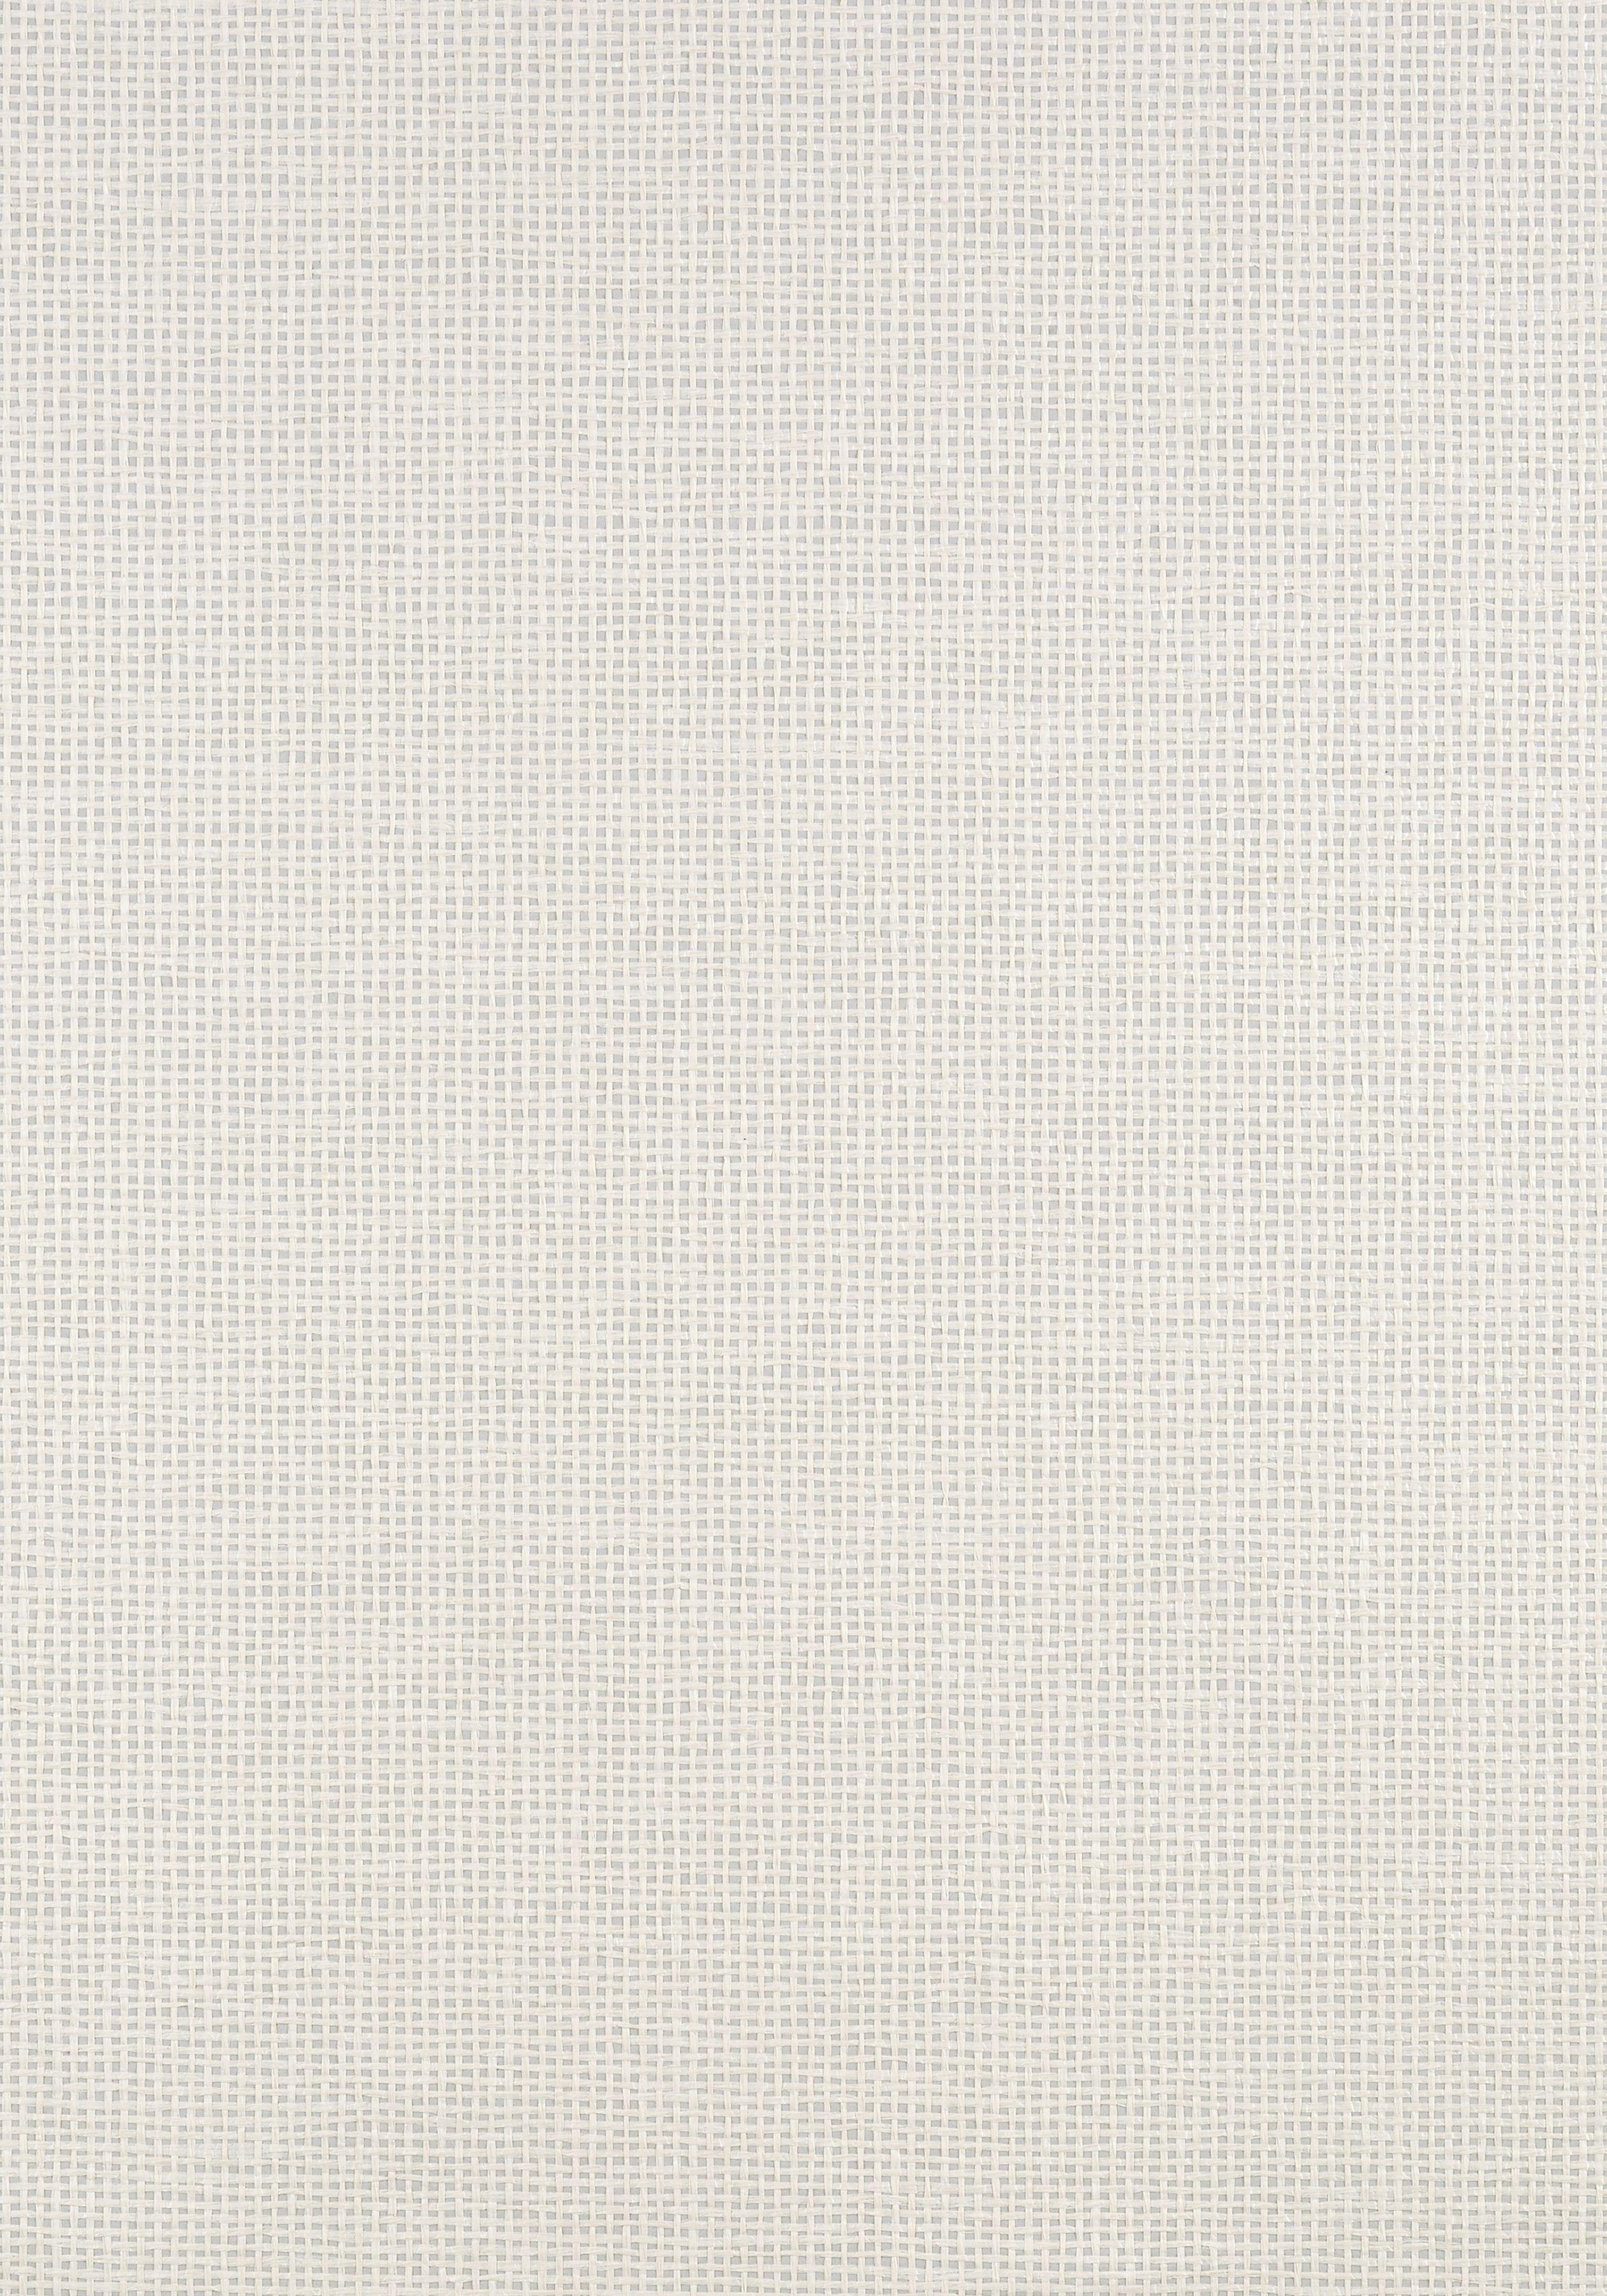 Grasscloth wallpaper anyone? MOD WEAVE, Grey, T36141